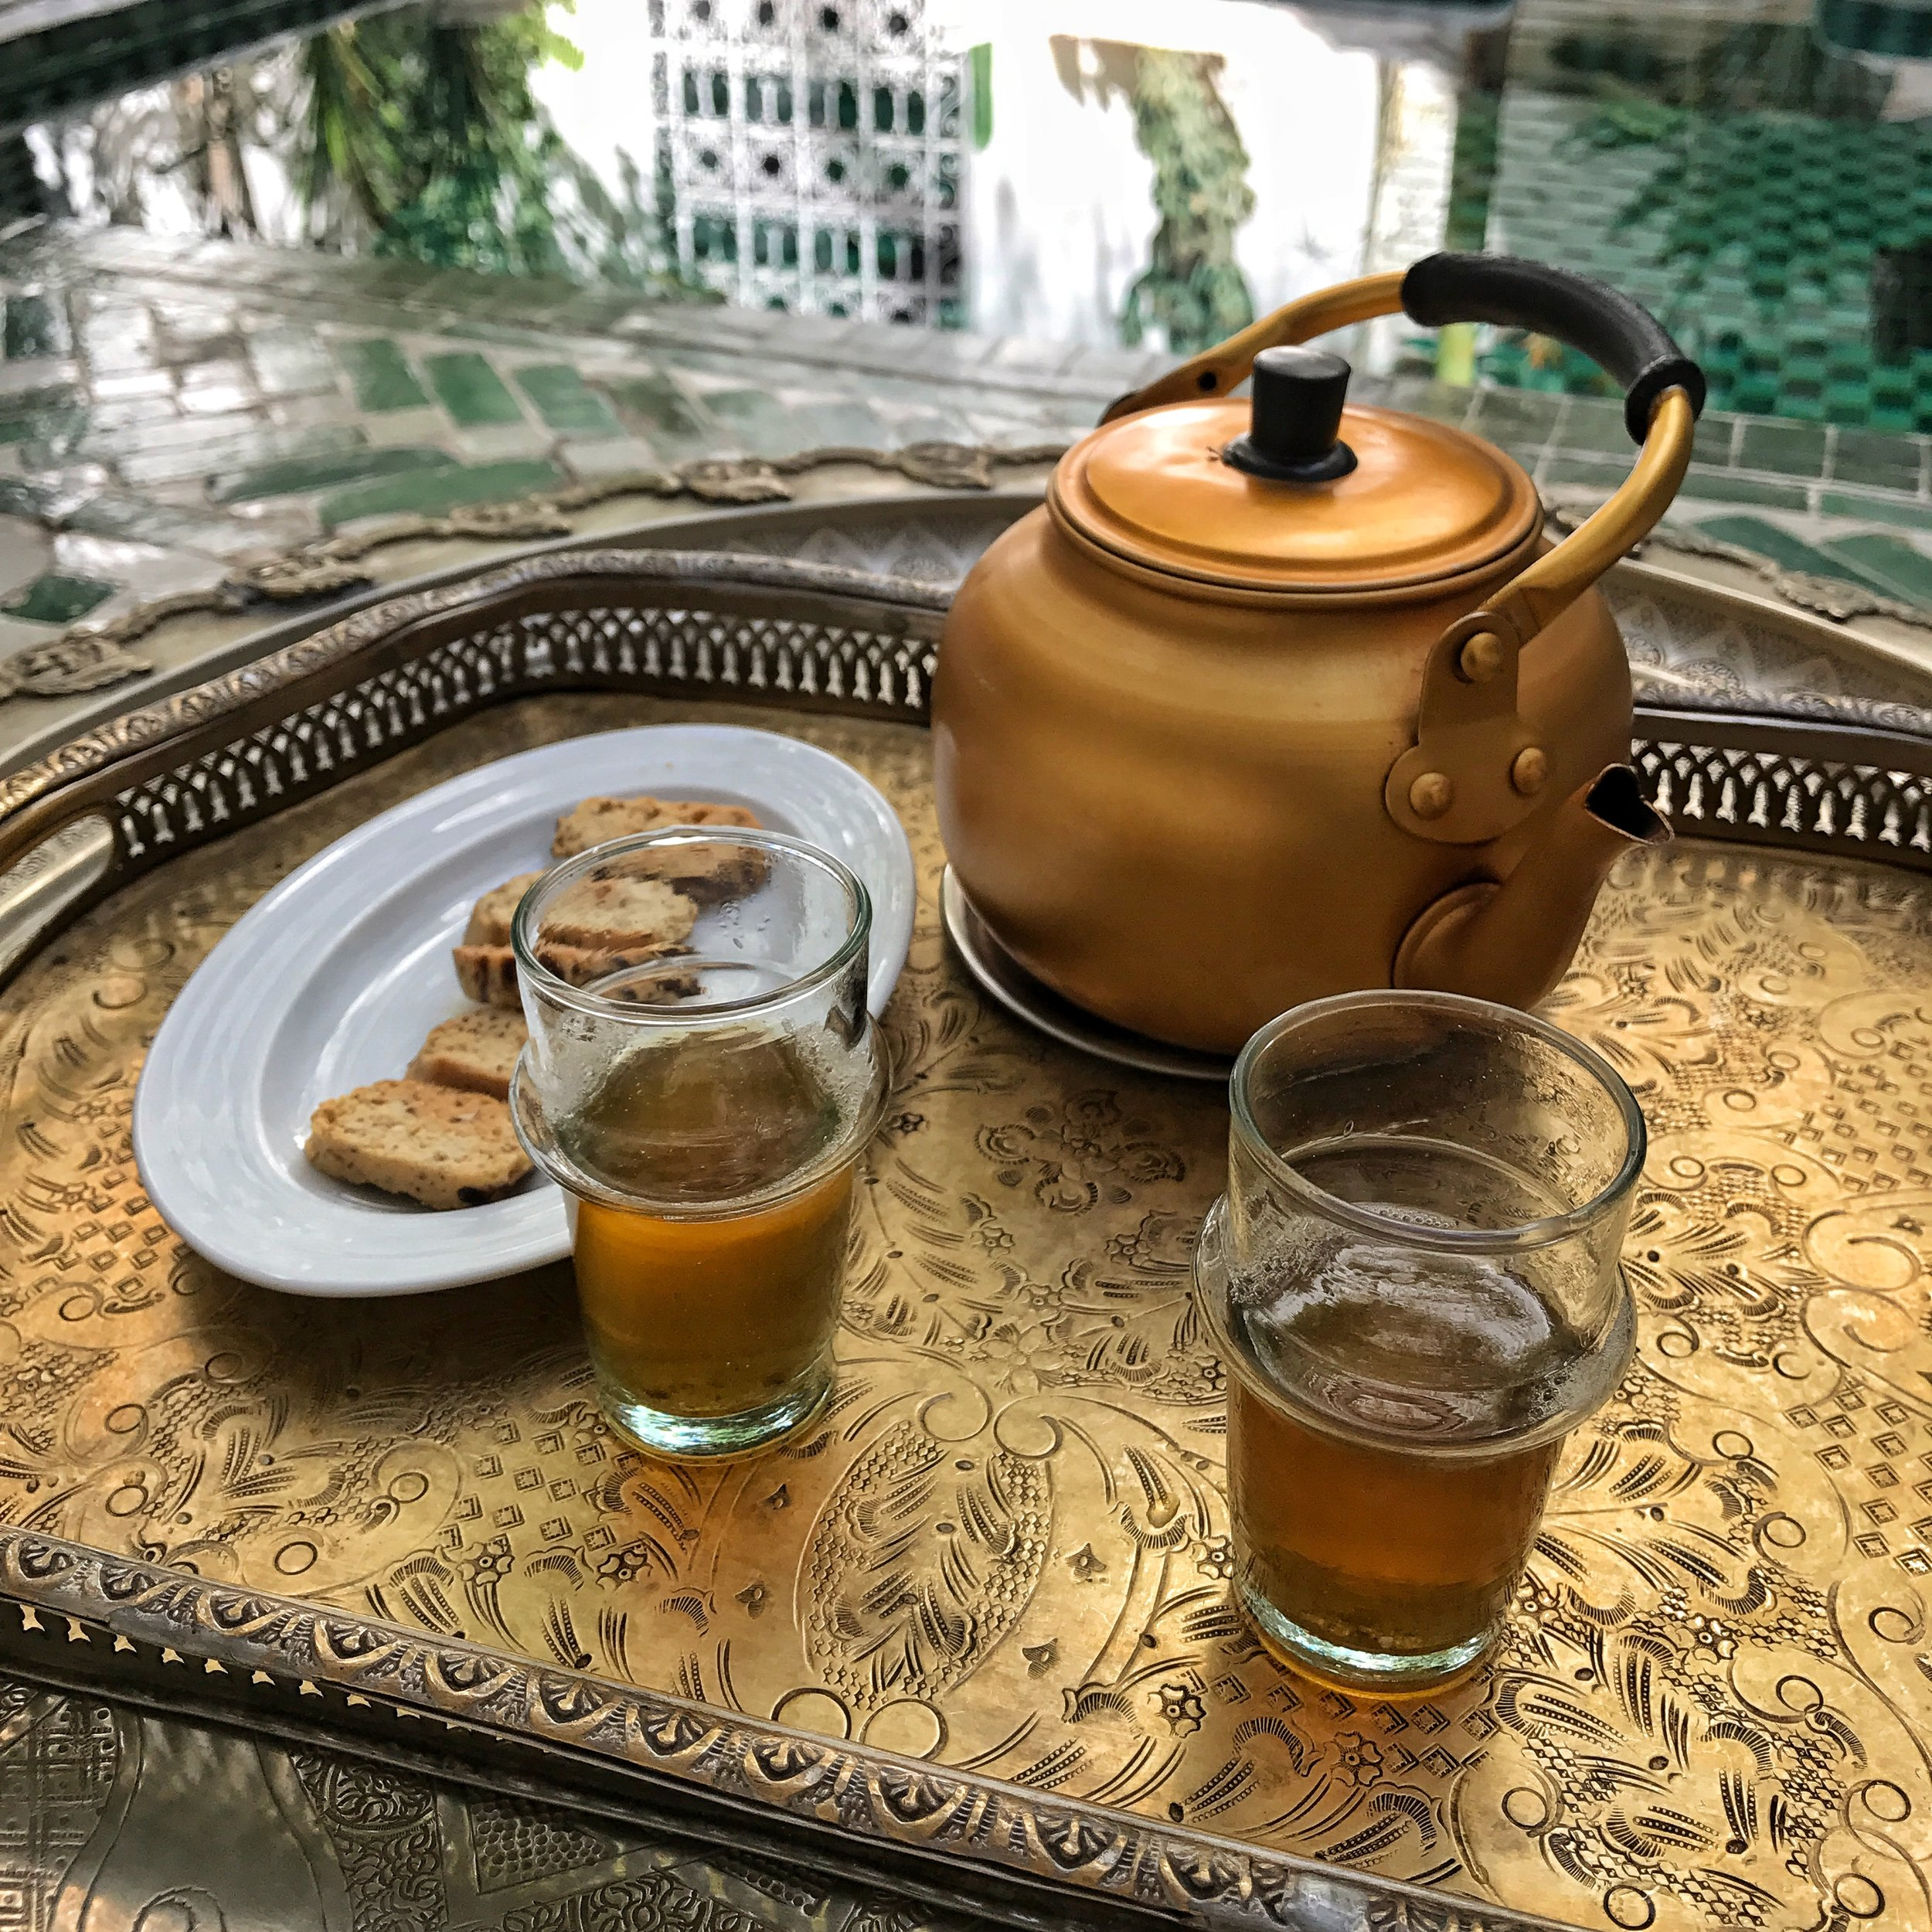 Moroccan tea! mmm